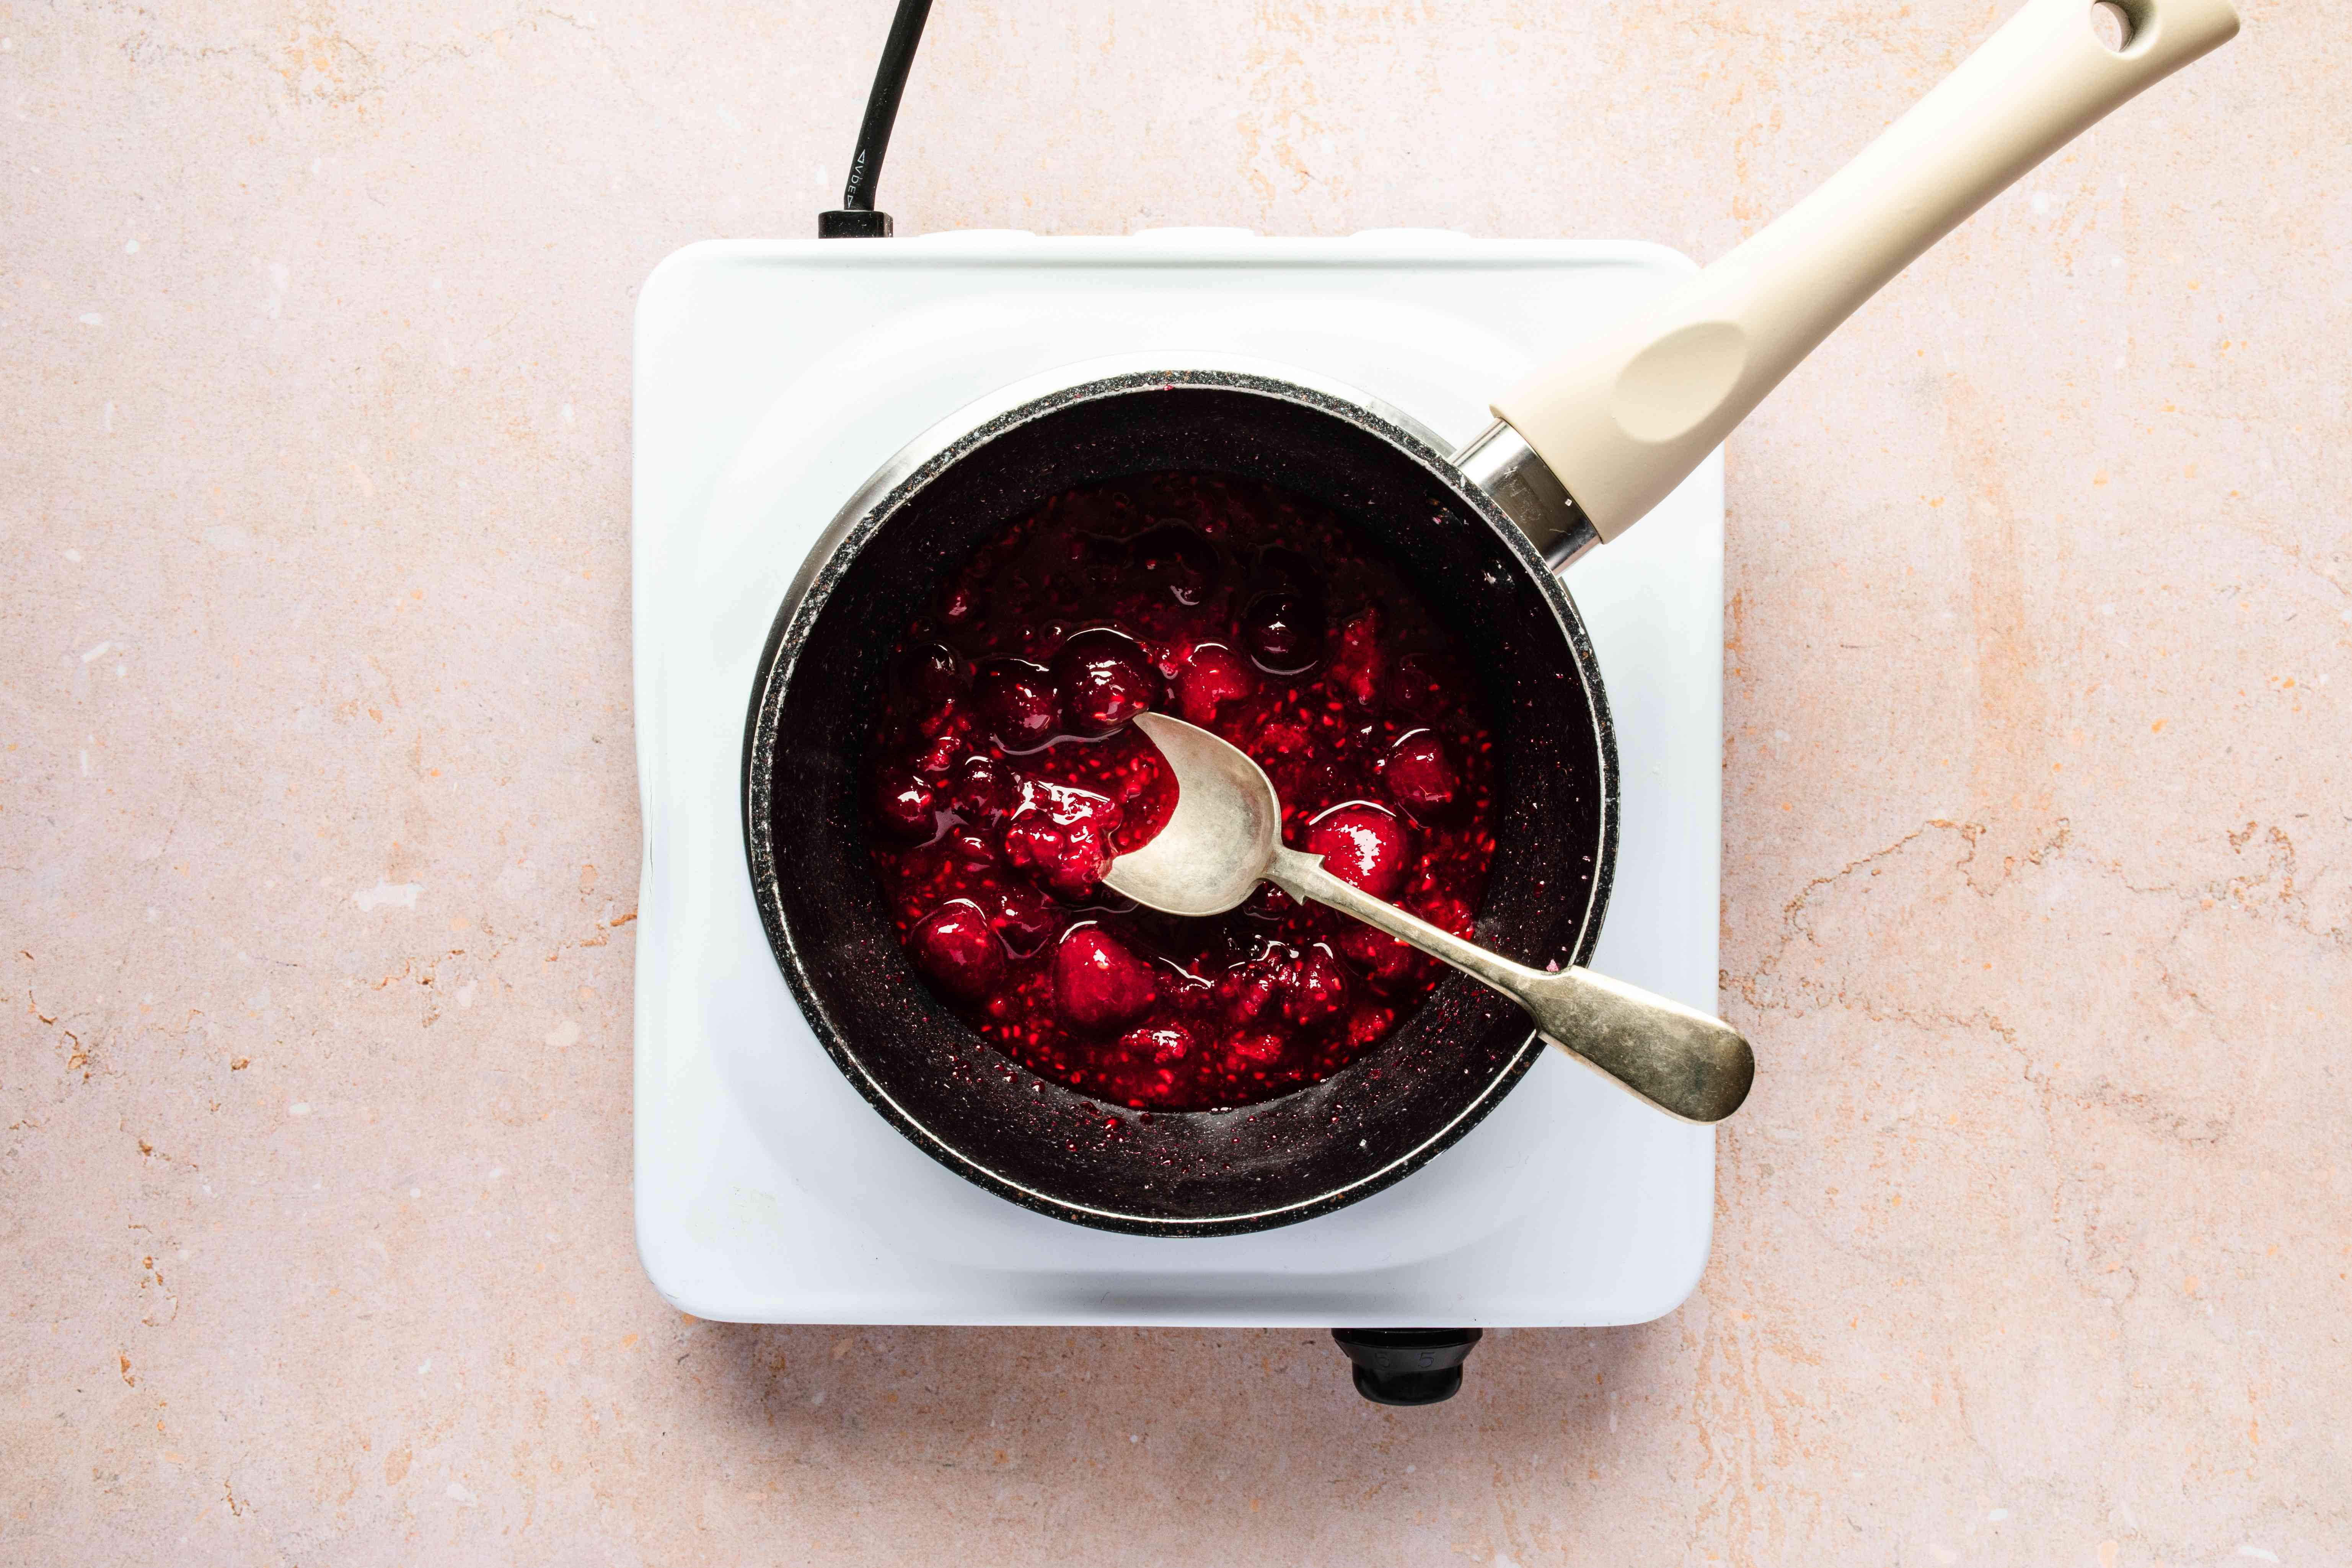 Place raspberries in pot